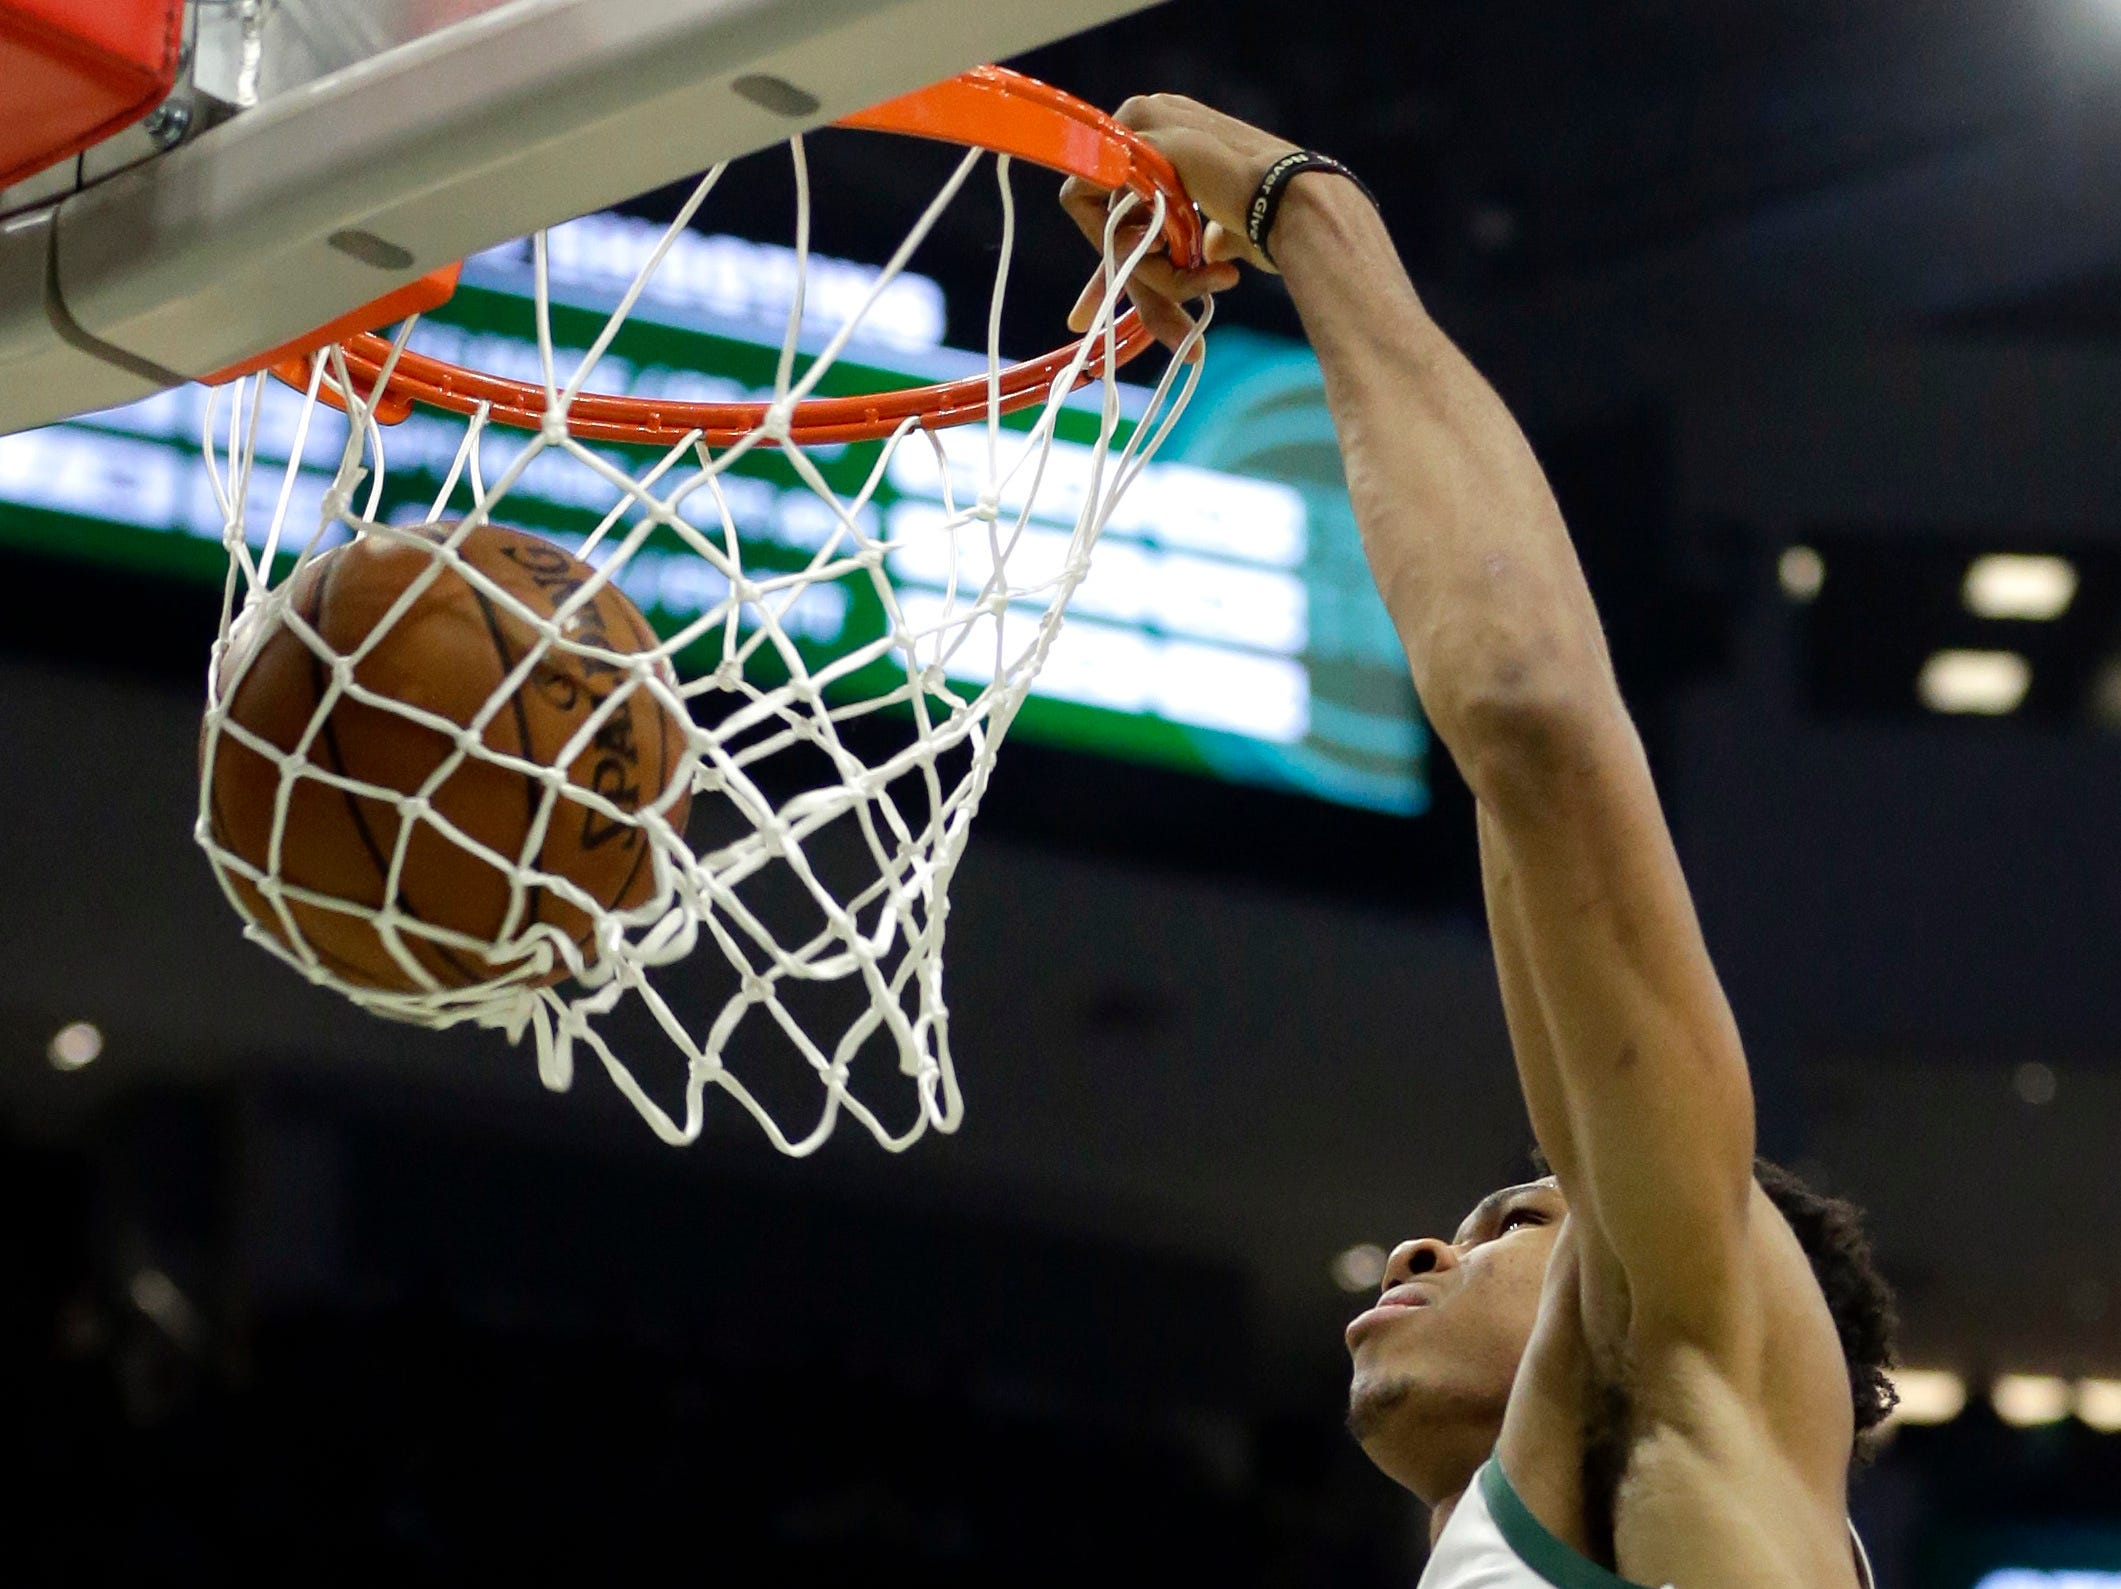 Milwaukee Bucks' Giannis Antetokounmpo dunks during the second half.